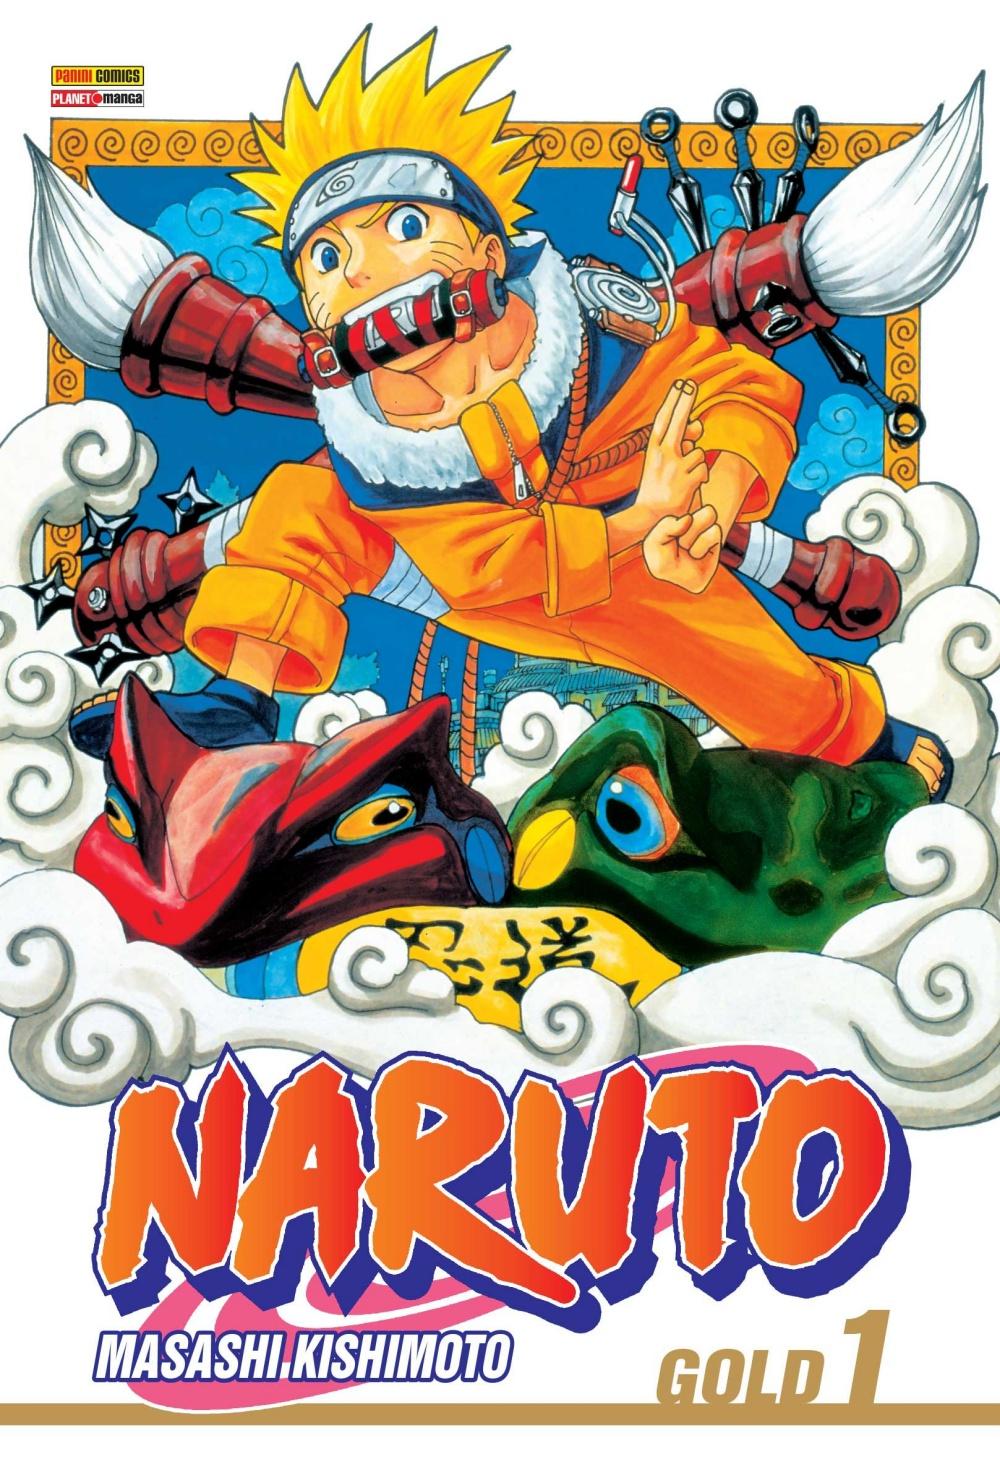 Naruto chega em formato digital pela Panini